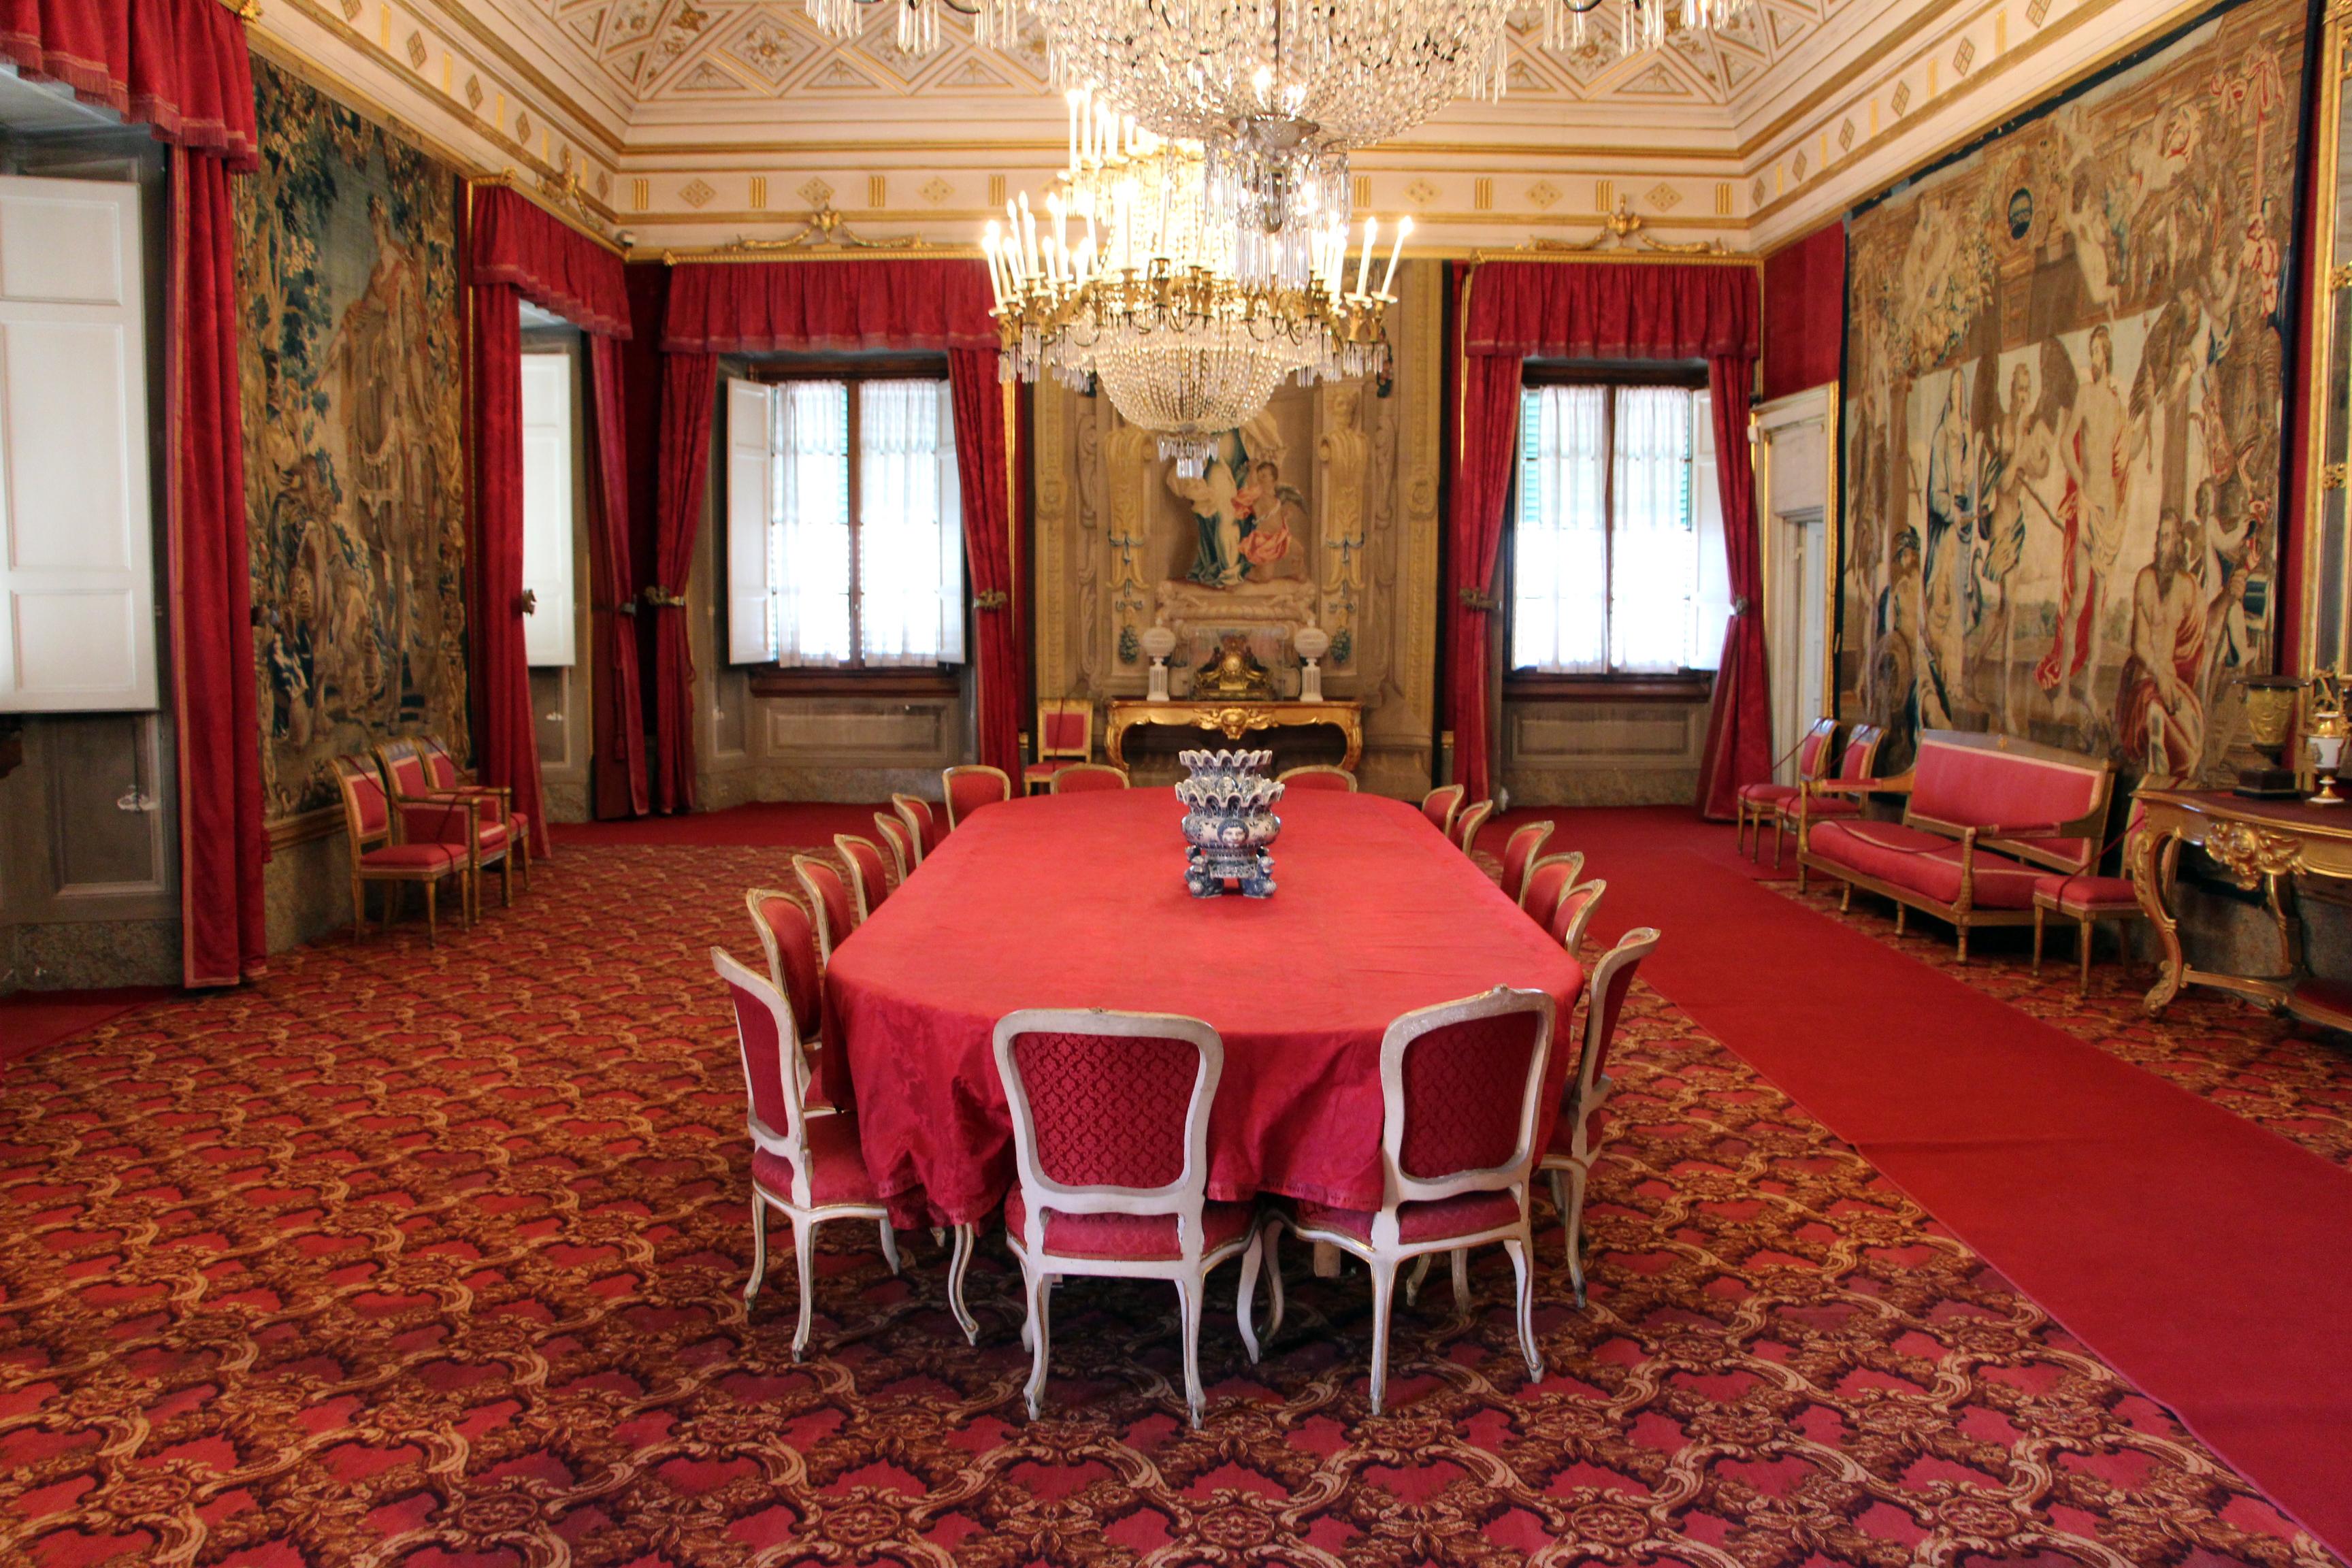 File:La Petraia Sala Da Pranzo O Sala Rossa View 01.JPG Wikimedia  #7E2B20 3456 2304 Sala Da Pranzo Borsani